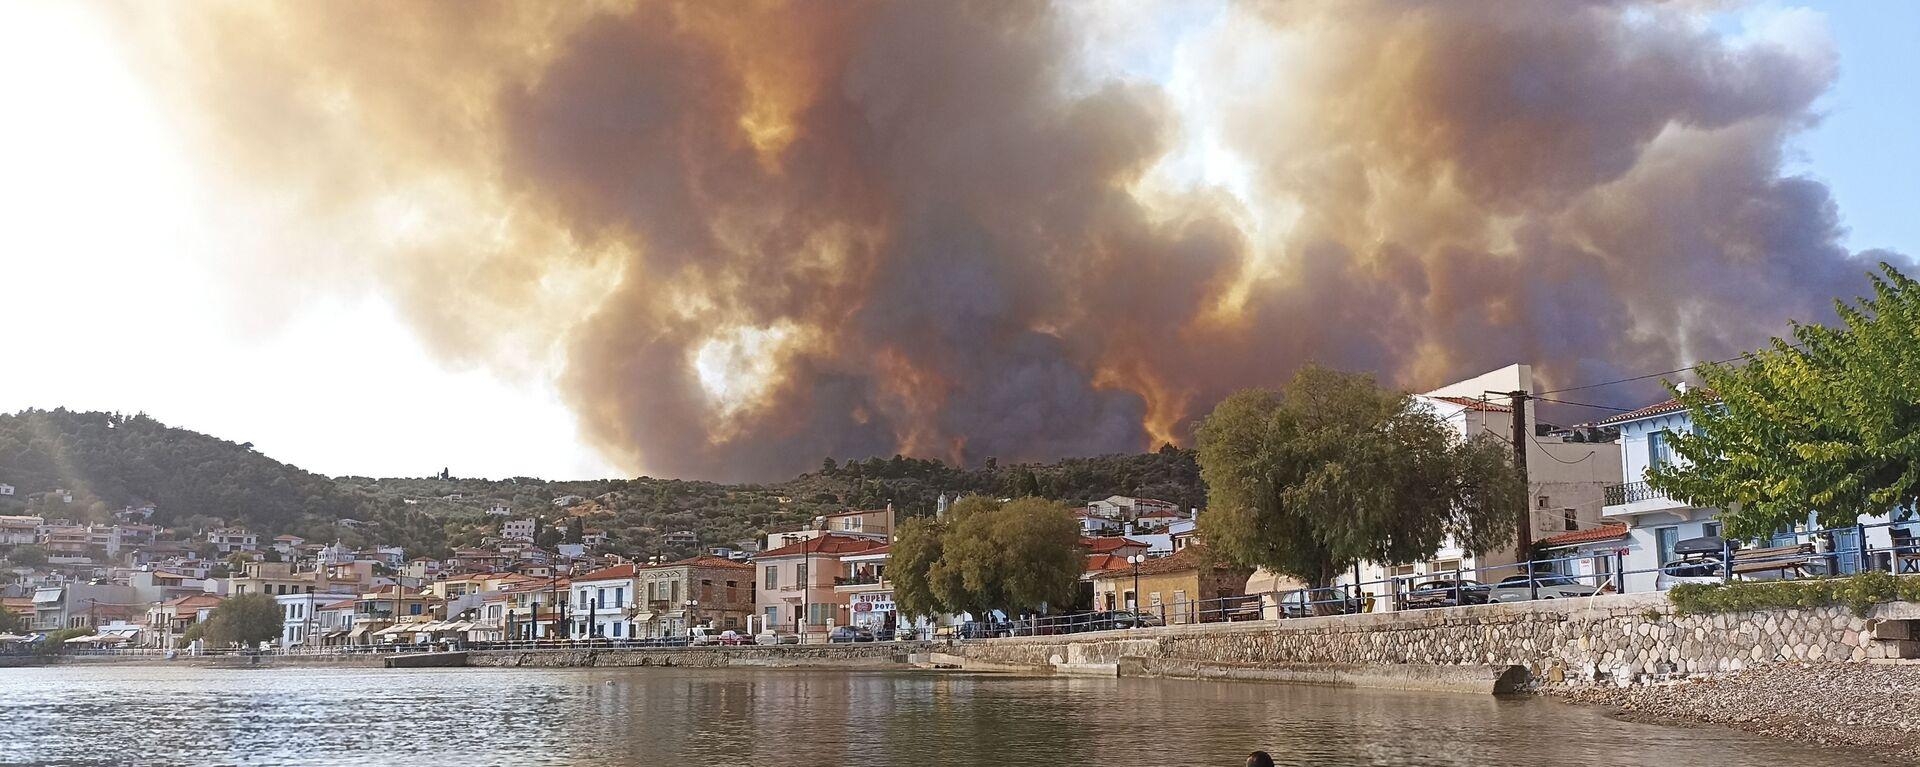 Пожар на острове Эвия, Греция  - Sputnik Česká republika, 1920, 09.08.2021